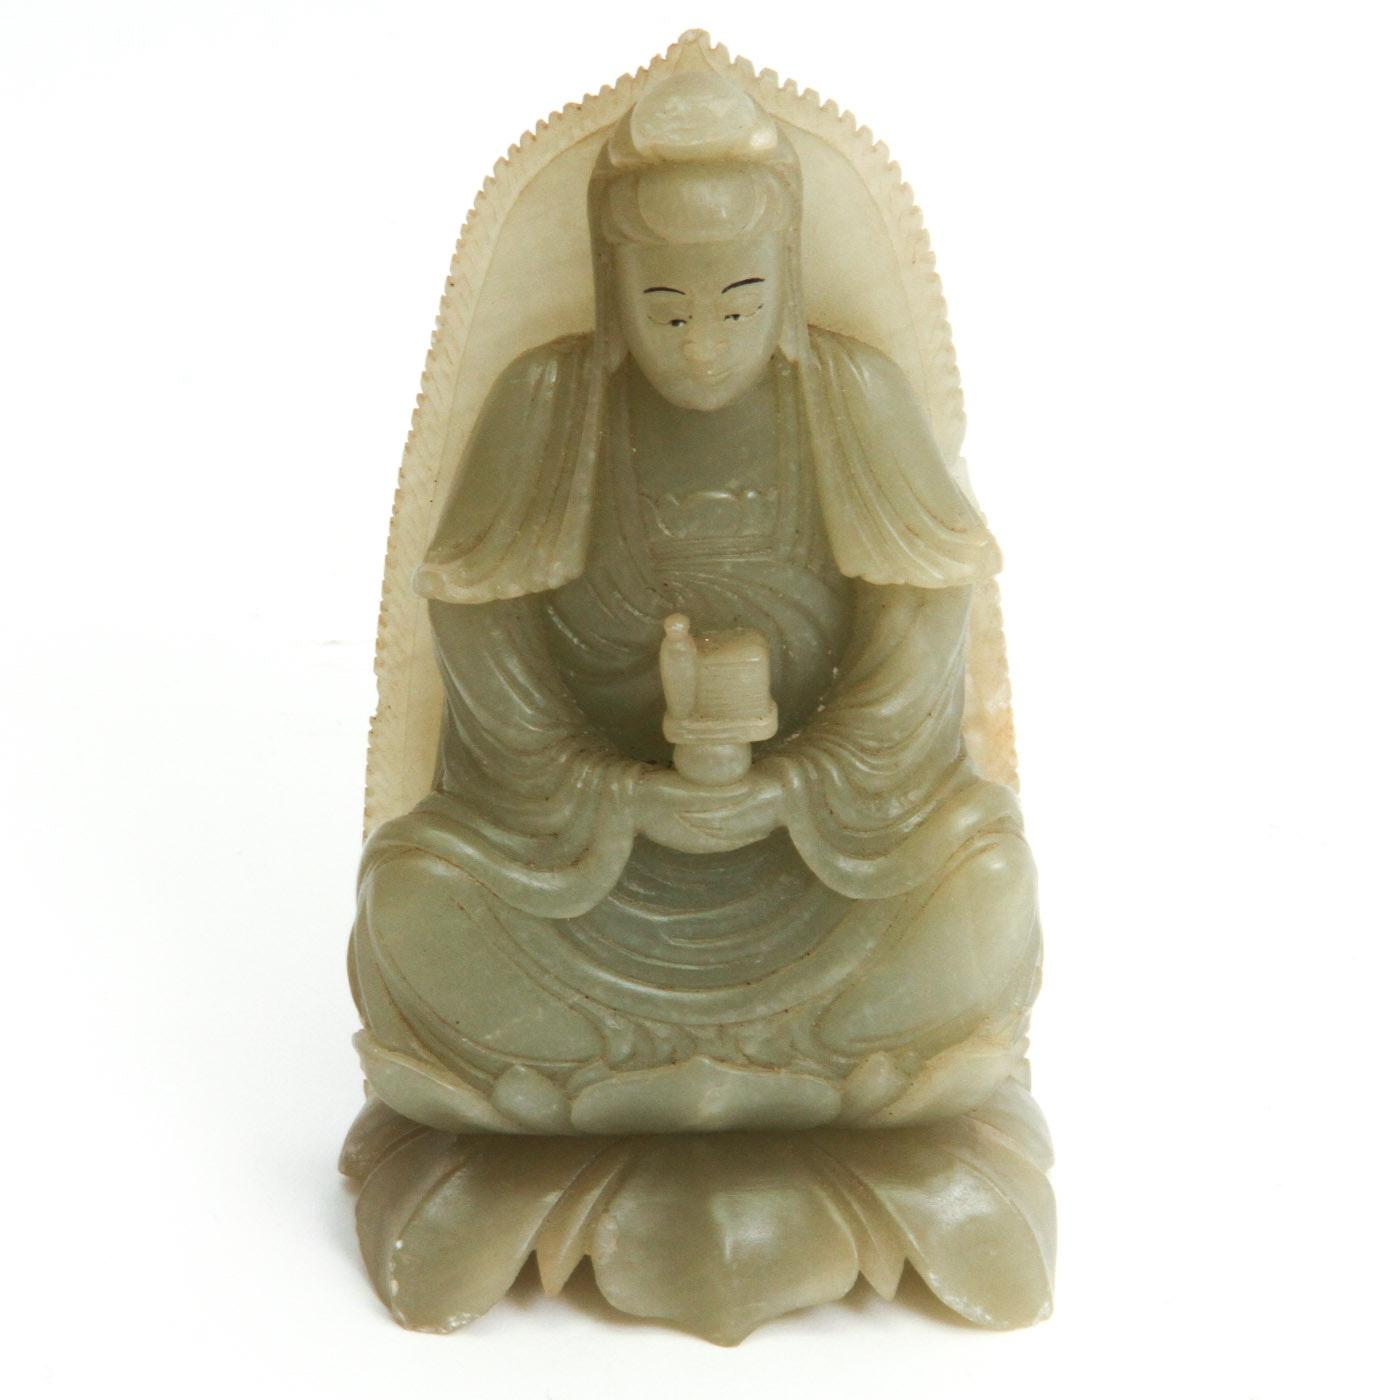 Vintage Carved Serpentine Buddha Carving